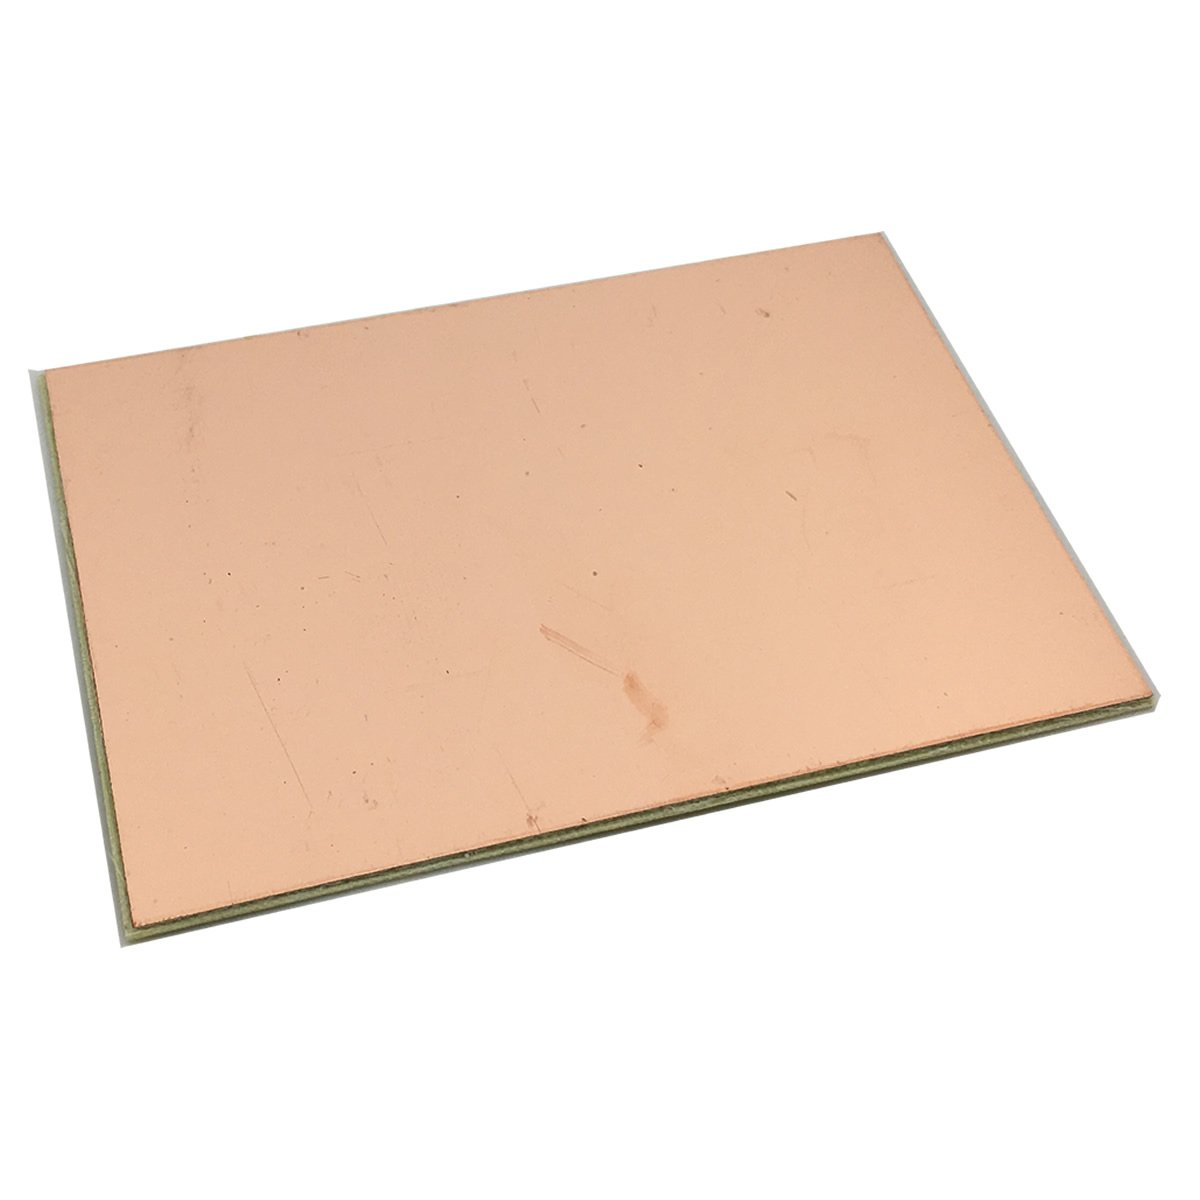 Mcigicm Copper Clad Pcb 10pcs Fr 4 Board Single Side Plain Copperclad Fibreglass Circuit Rapid Online Plate Diy Kit Laminate 100x70mm Industrial Scientific